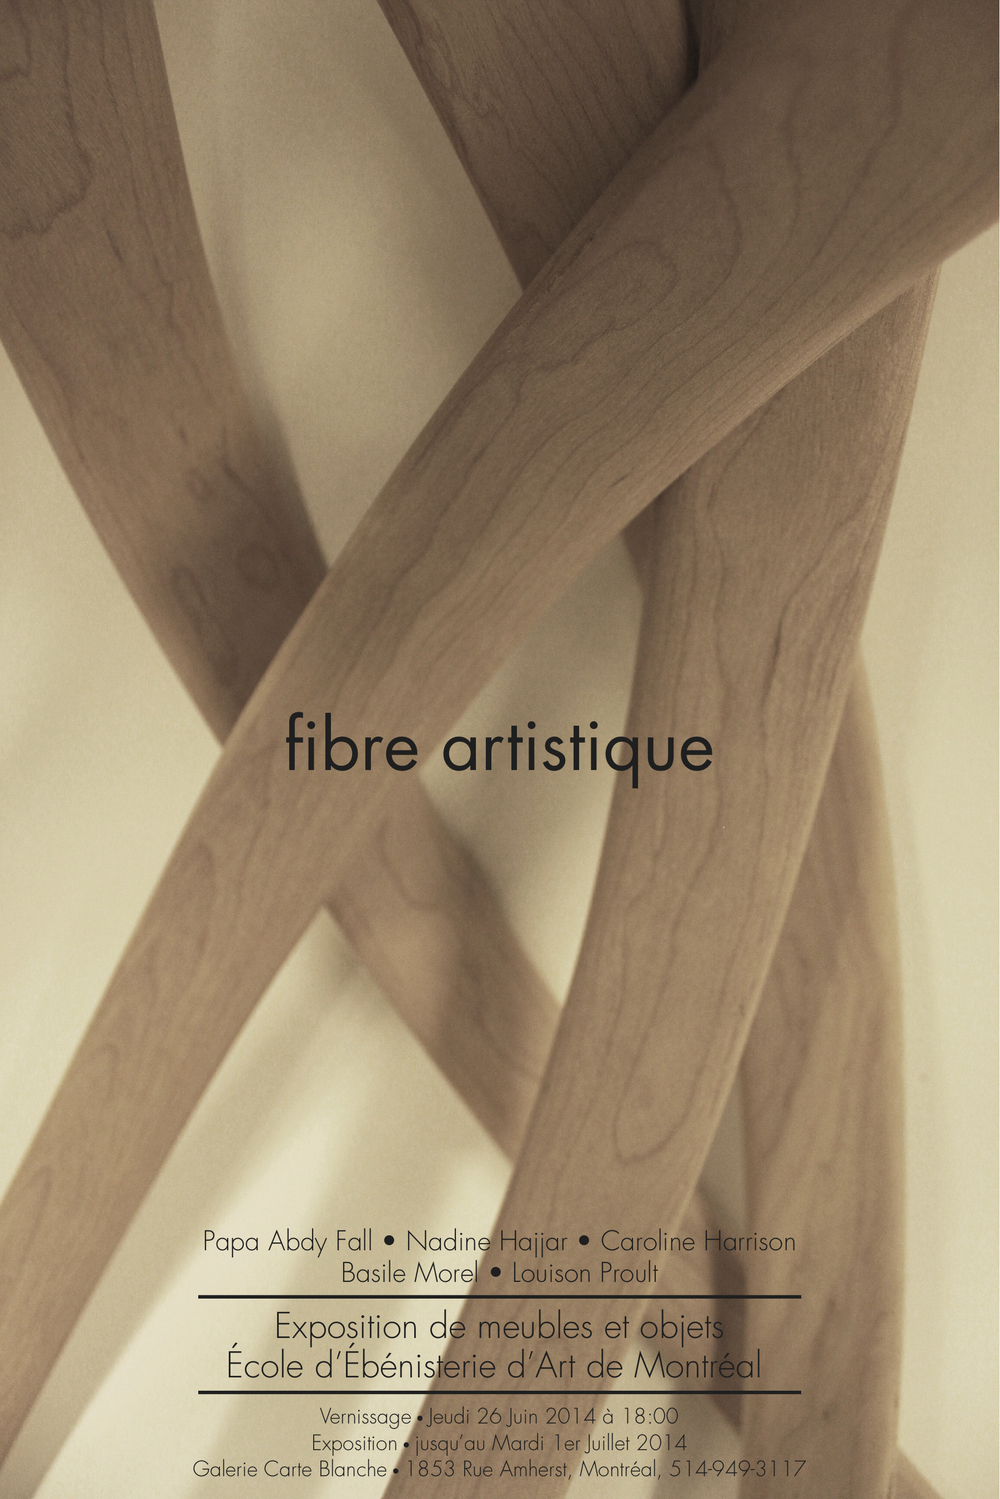 Fibre artistique - invitation.jpg